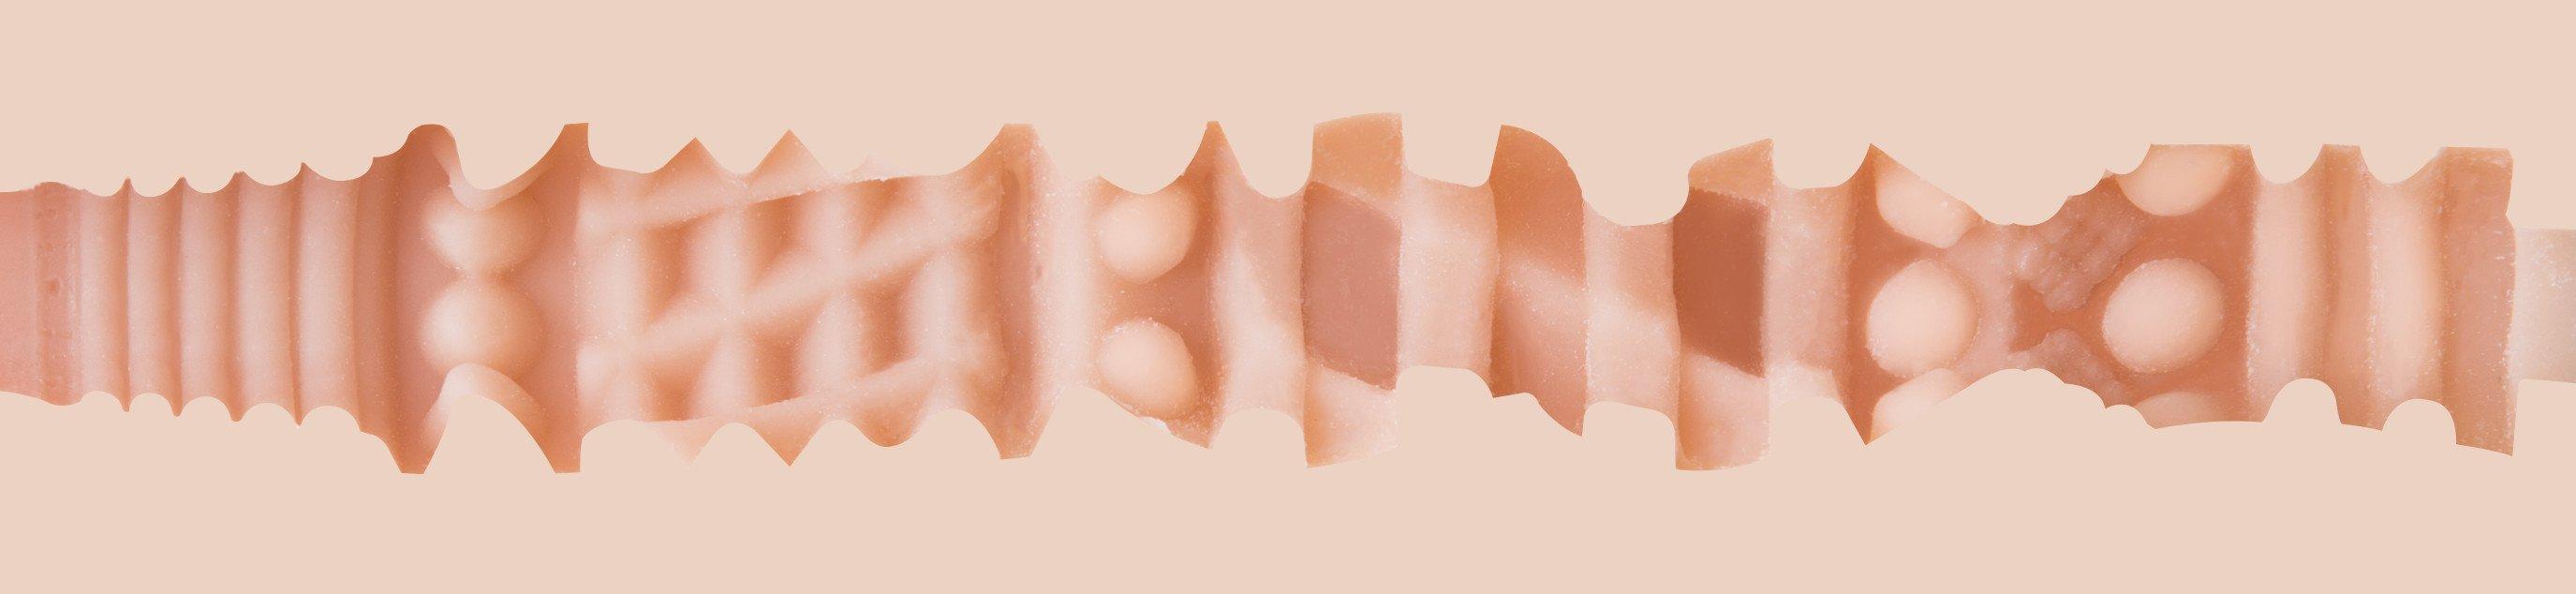 Wild Fleshlight Girls Texture Image